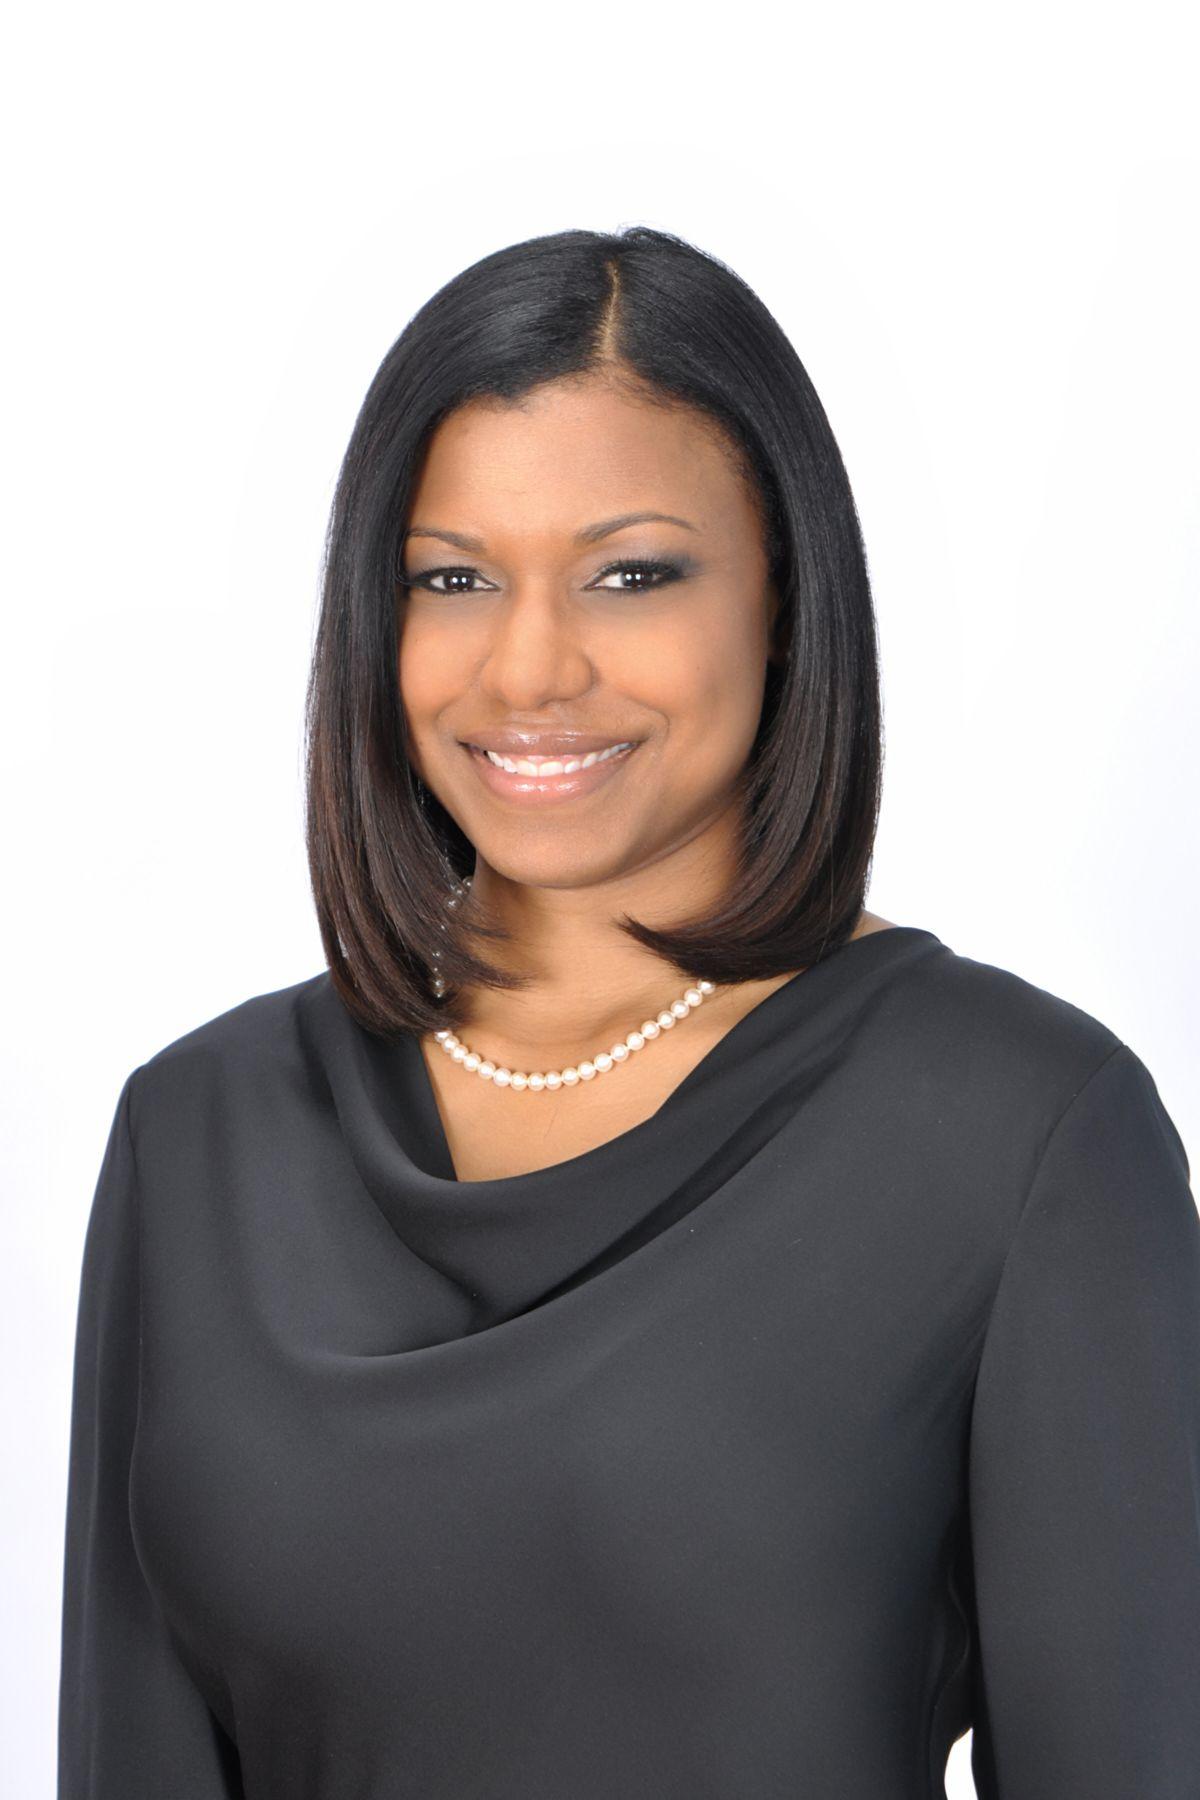 Raytheon Technologies Promotes Dantaya Williams to Chief Human Resources Officer, Raytheon Technologies